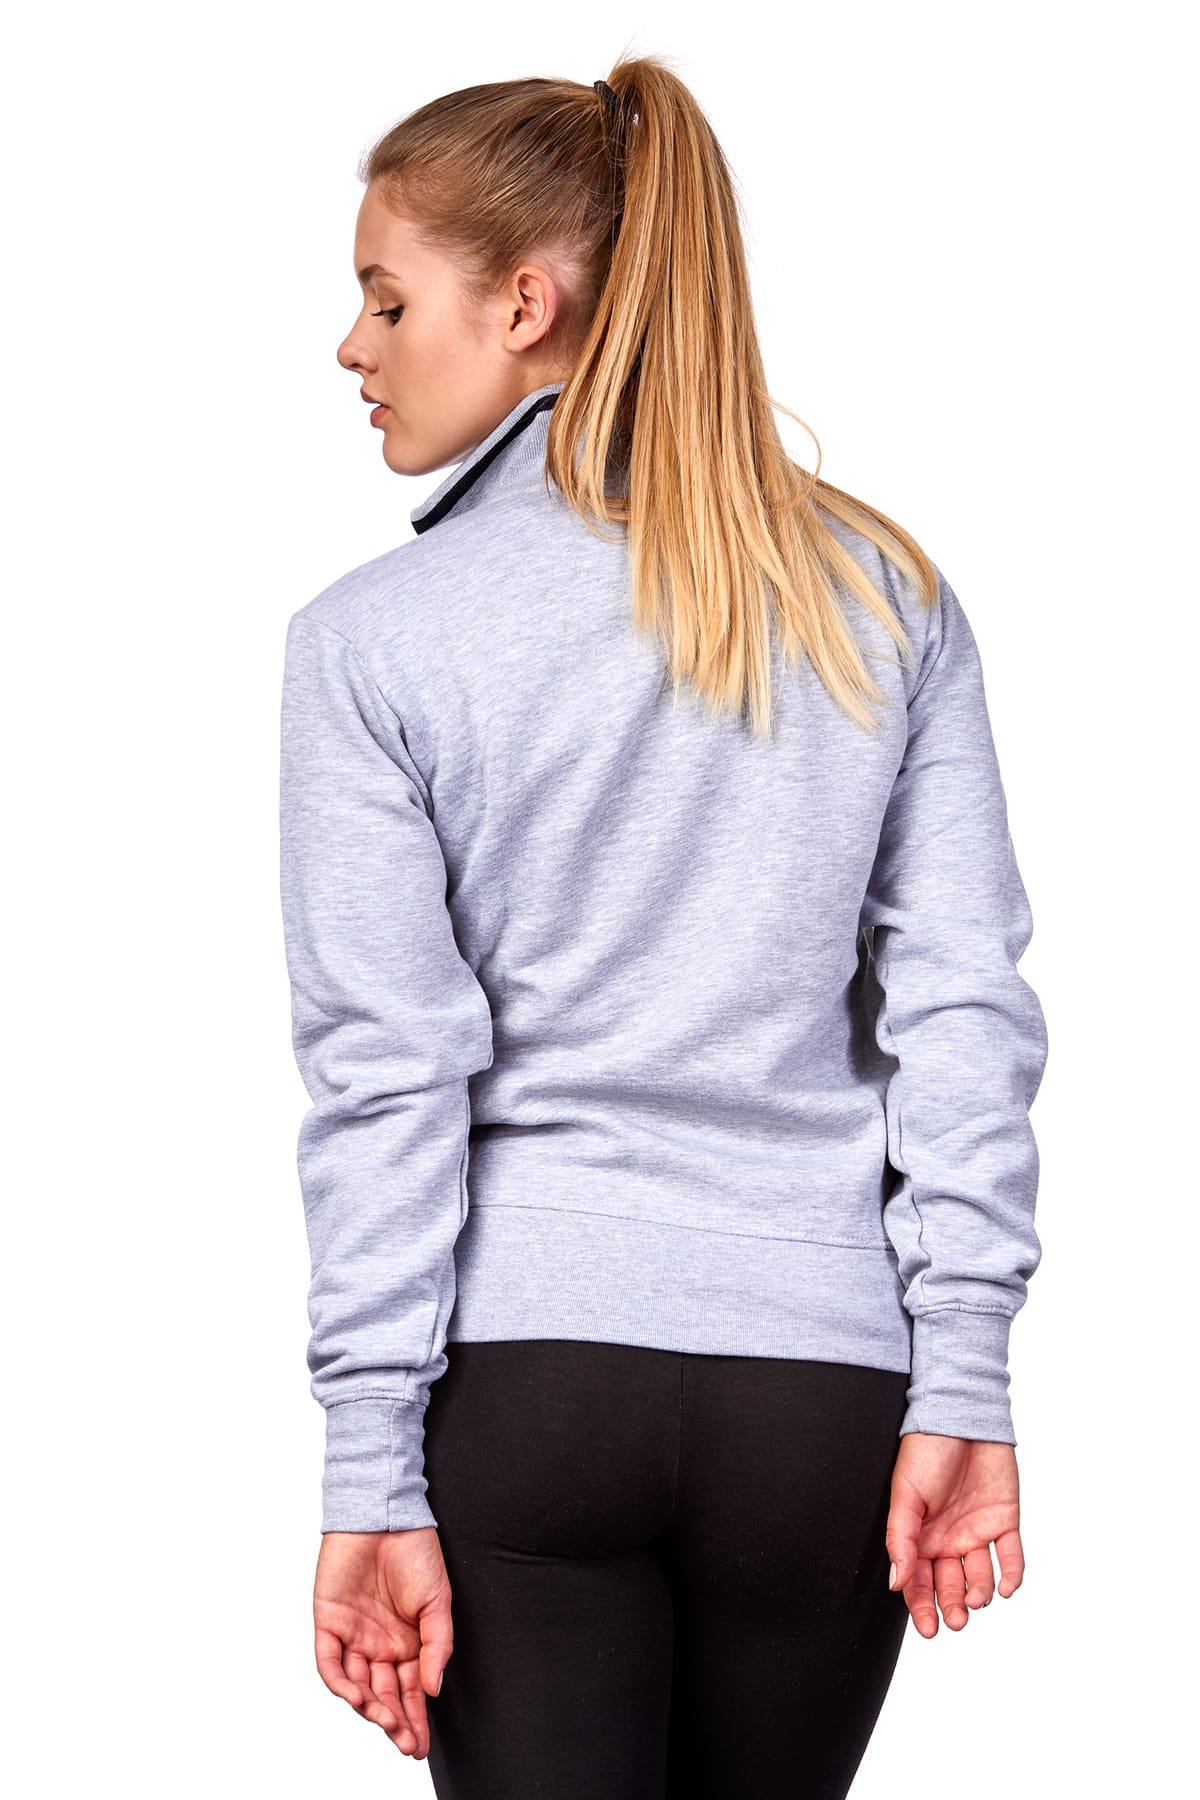 Damen Sweatjacke ohne Kapuze Melbourne – Bild 10 59343d8974